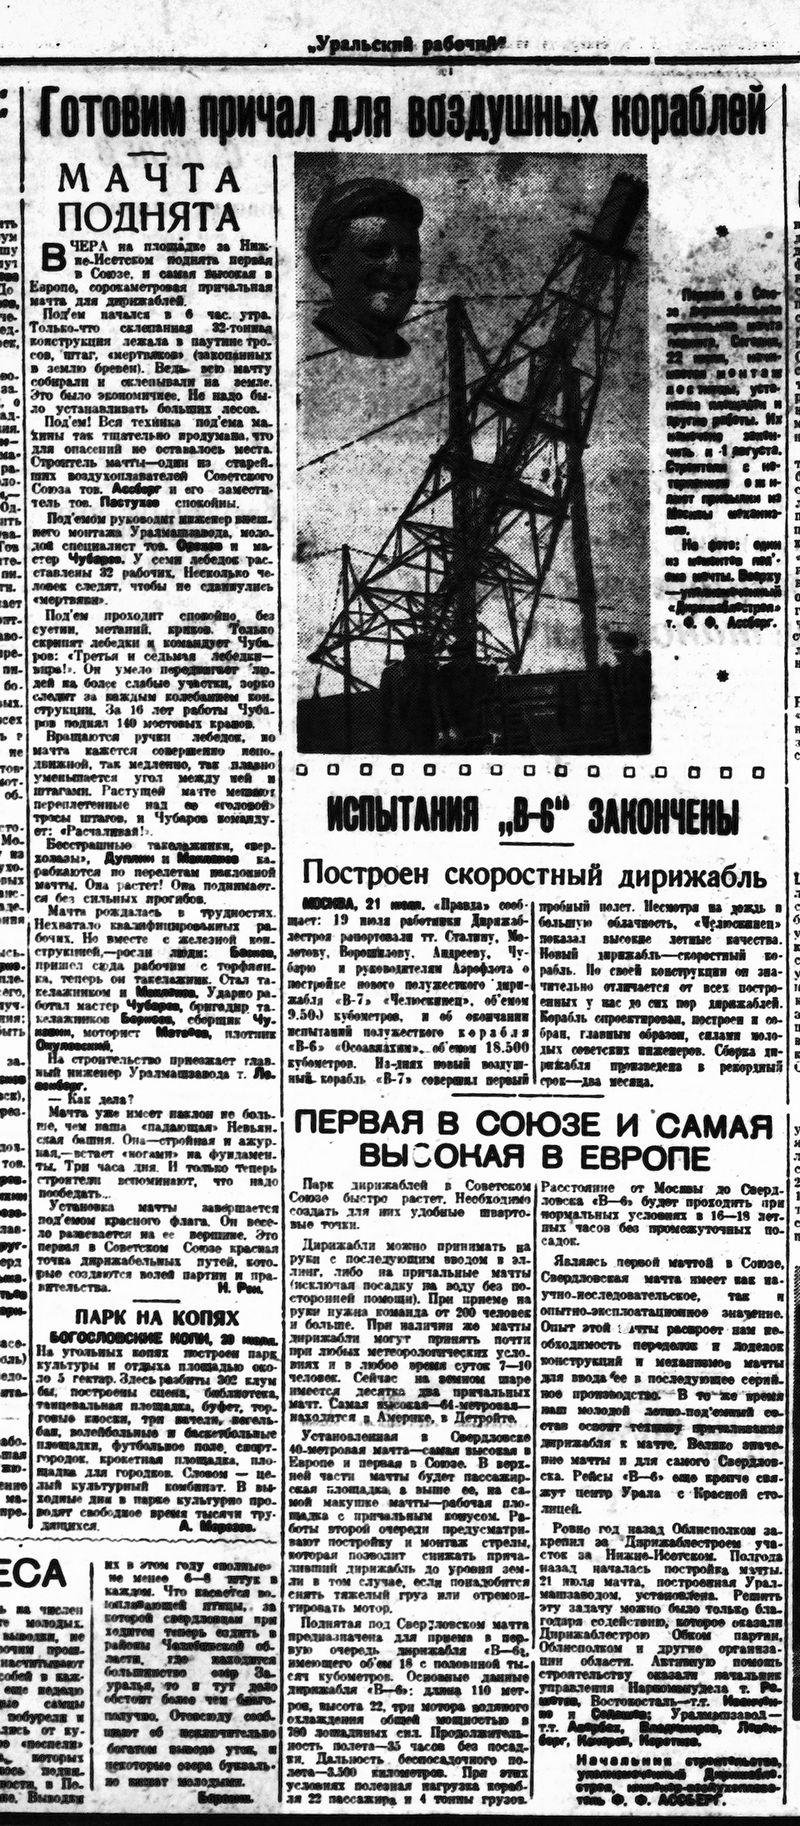 ur-1935.07.22